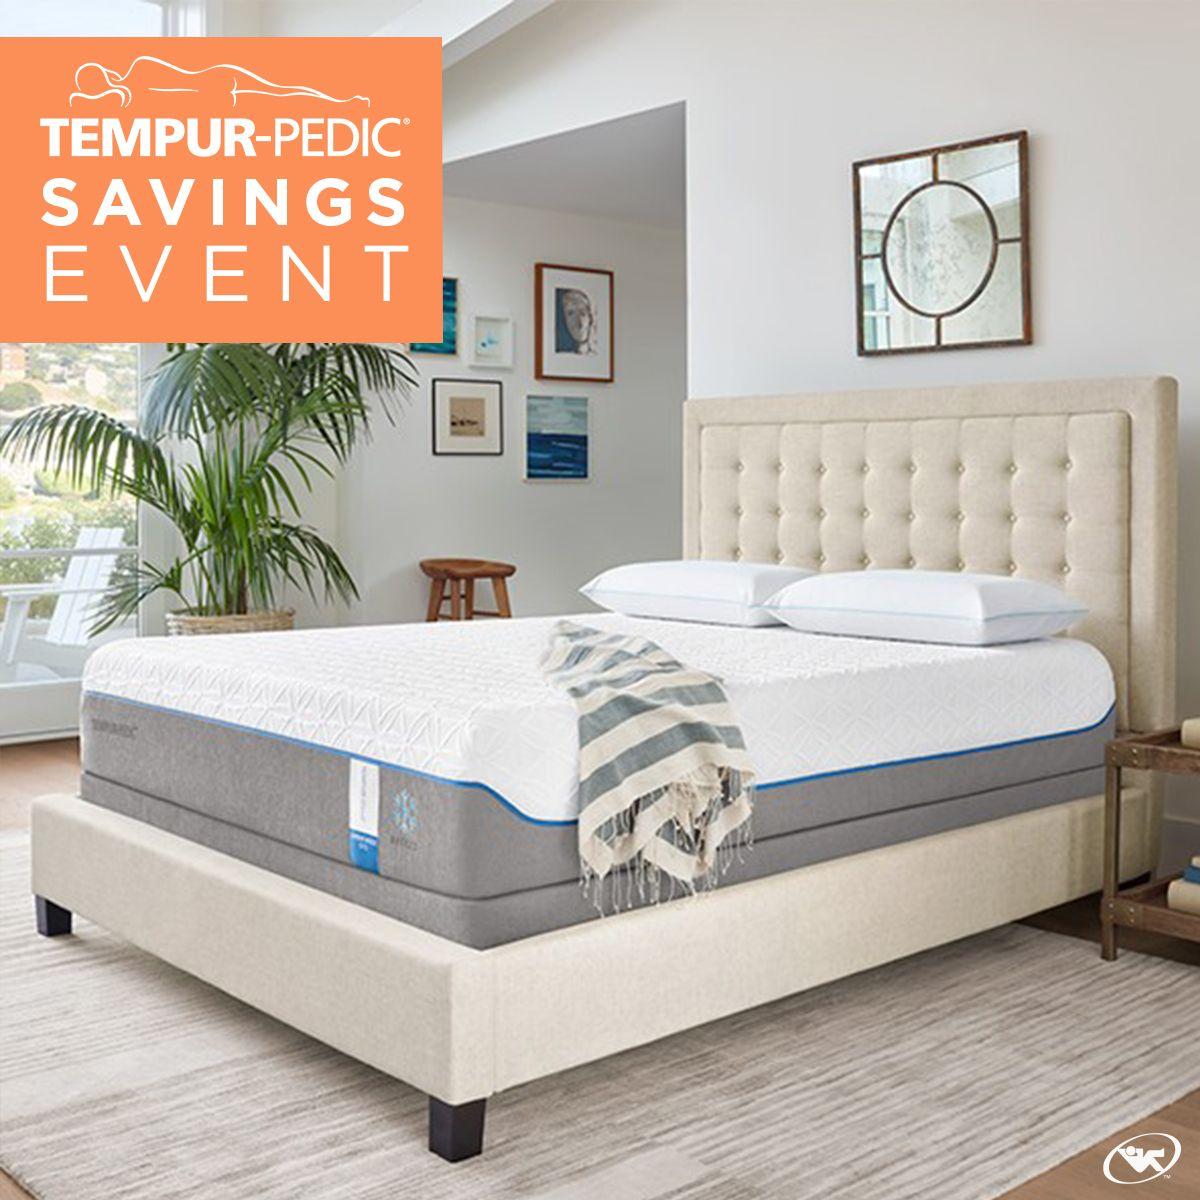 Fall Into Savings Save Up To 500 On Select Adjustable Mattress Sets During Our Tempur Pedic Fall Savings Event With Images Mattress Sets Tempurpedic Mattress Mattress